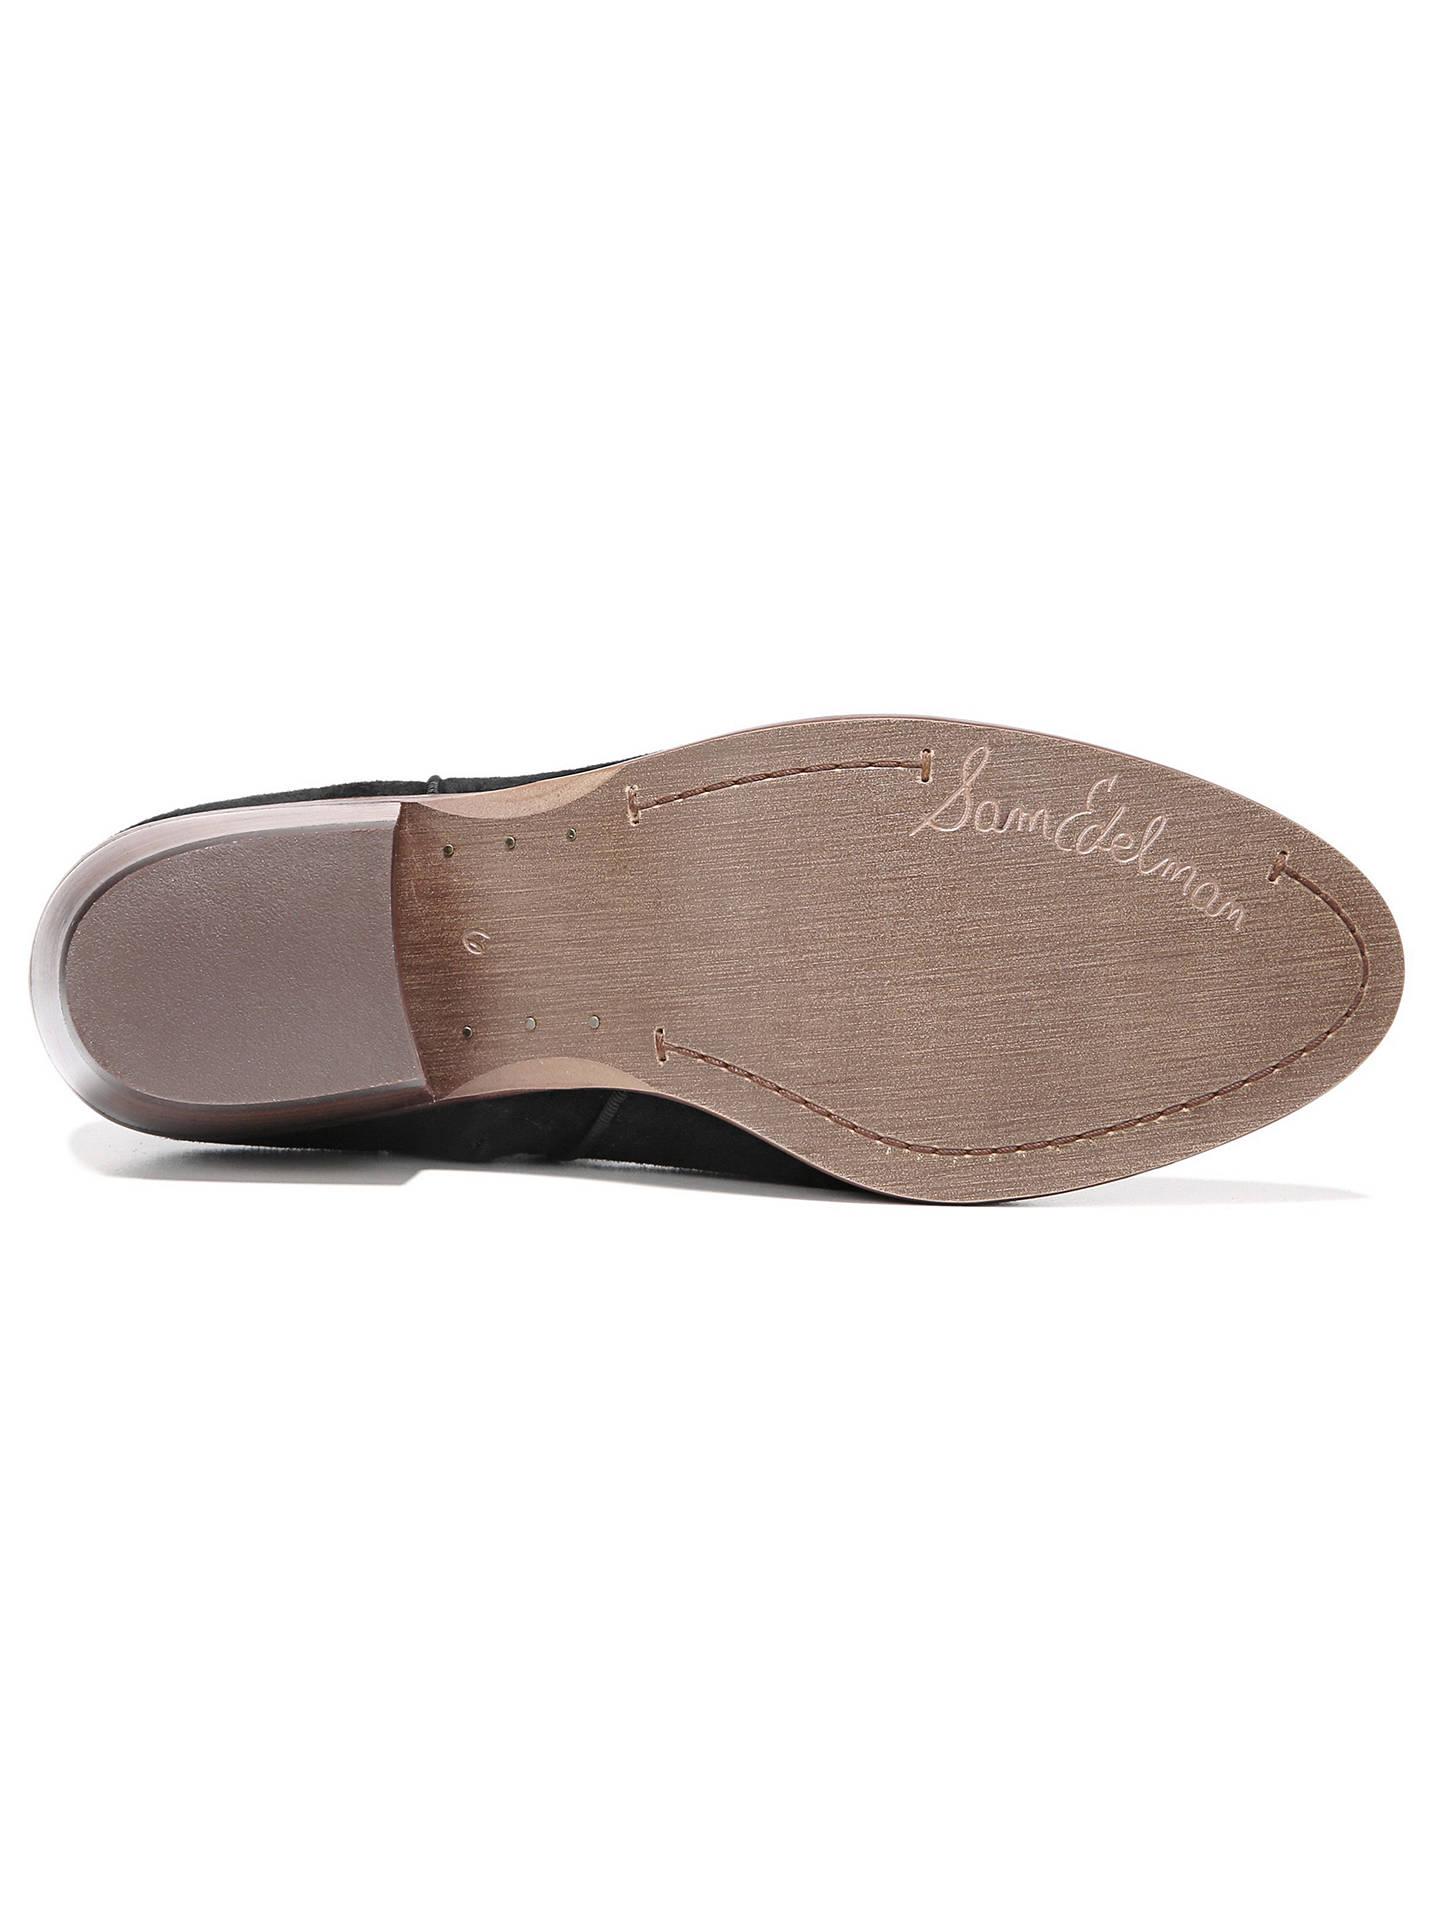 18d7b9065829cd Buy Sam Edelman Petty Block Heeled Ankle Boots